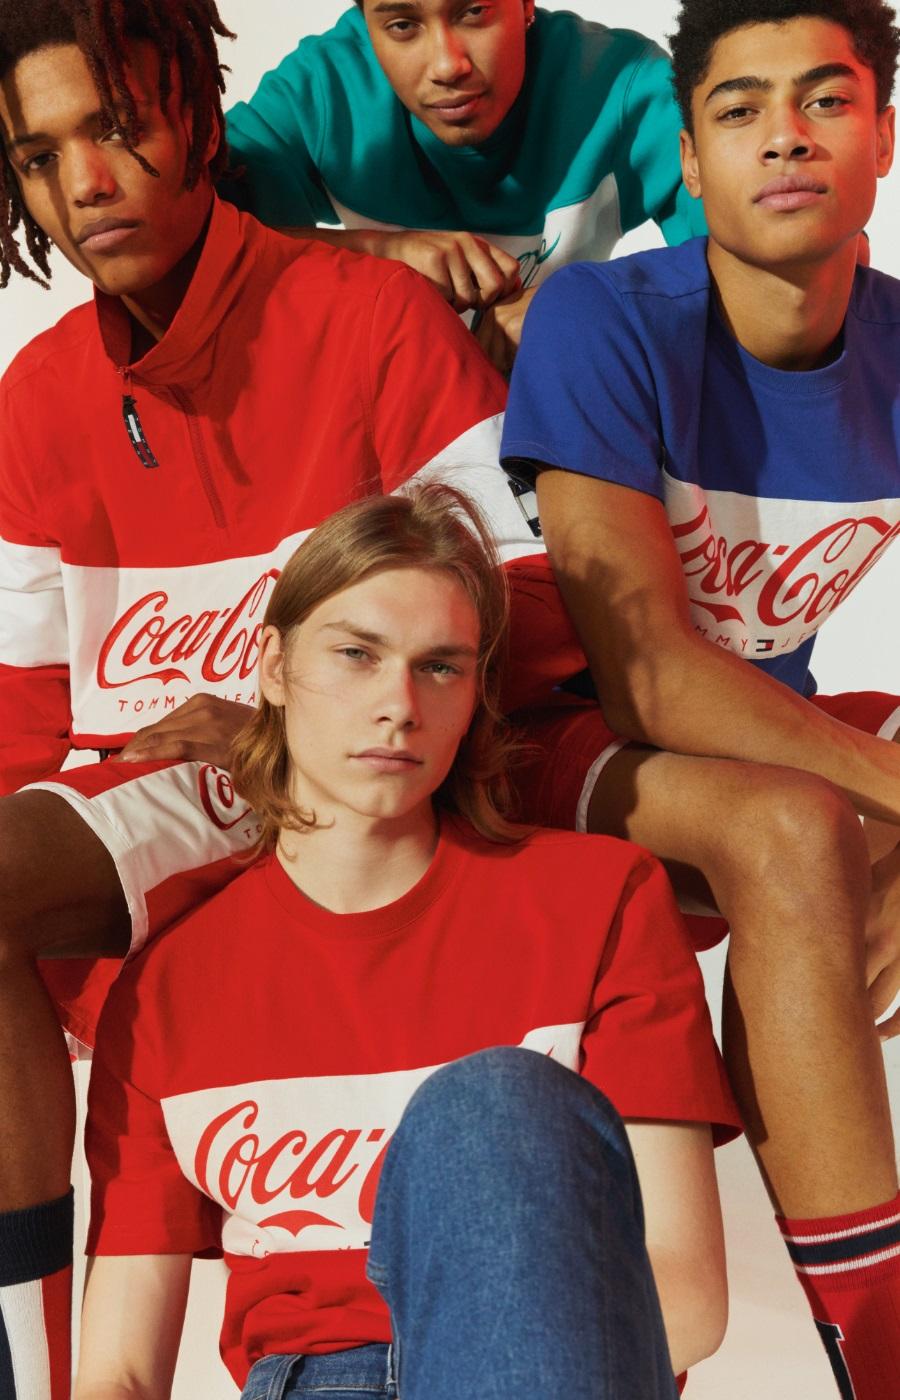 tommy-hilfiger-coca-cola-17